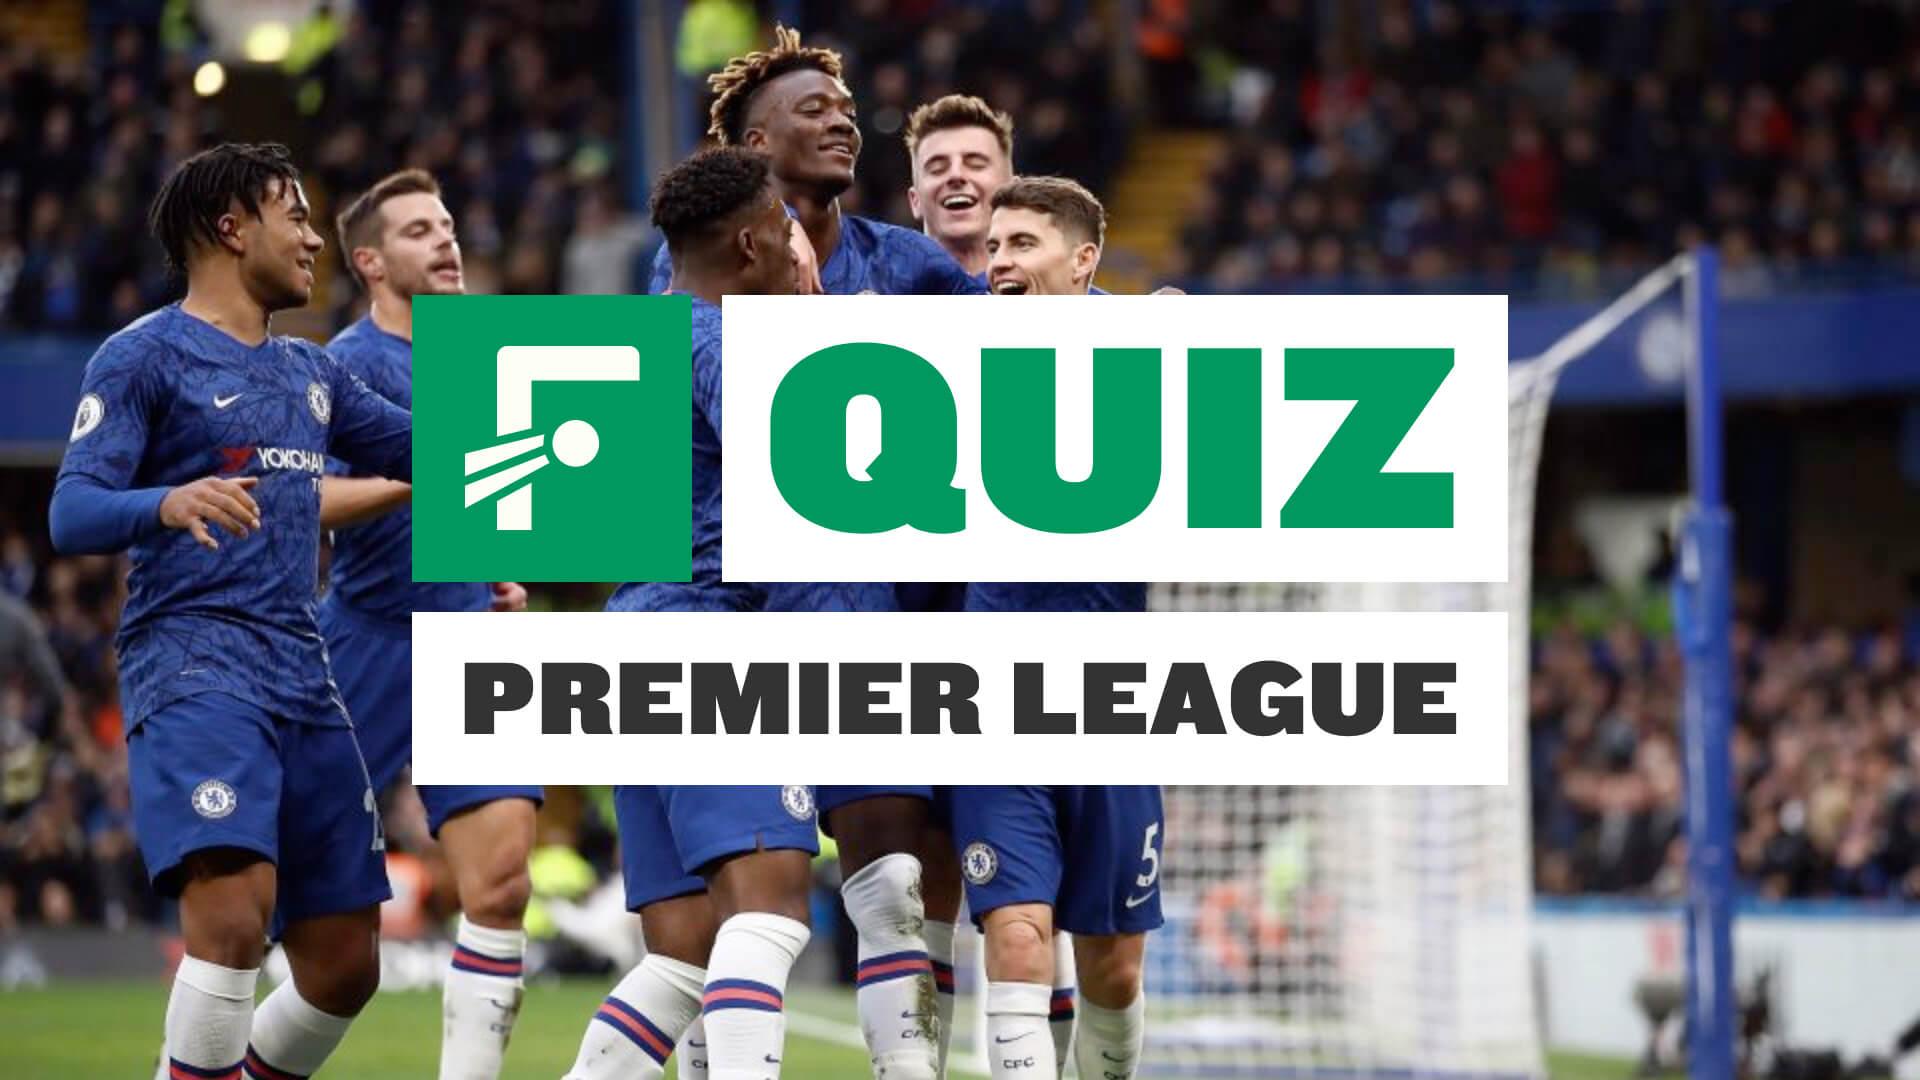 ✅ Quiz: 2019-20 Premier League Season (medium)